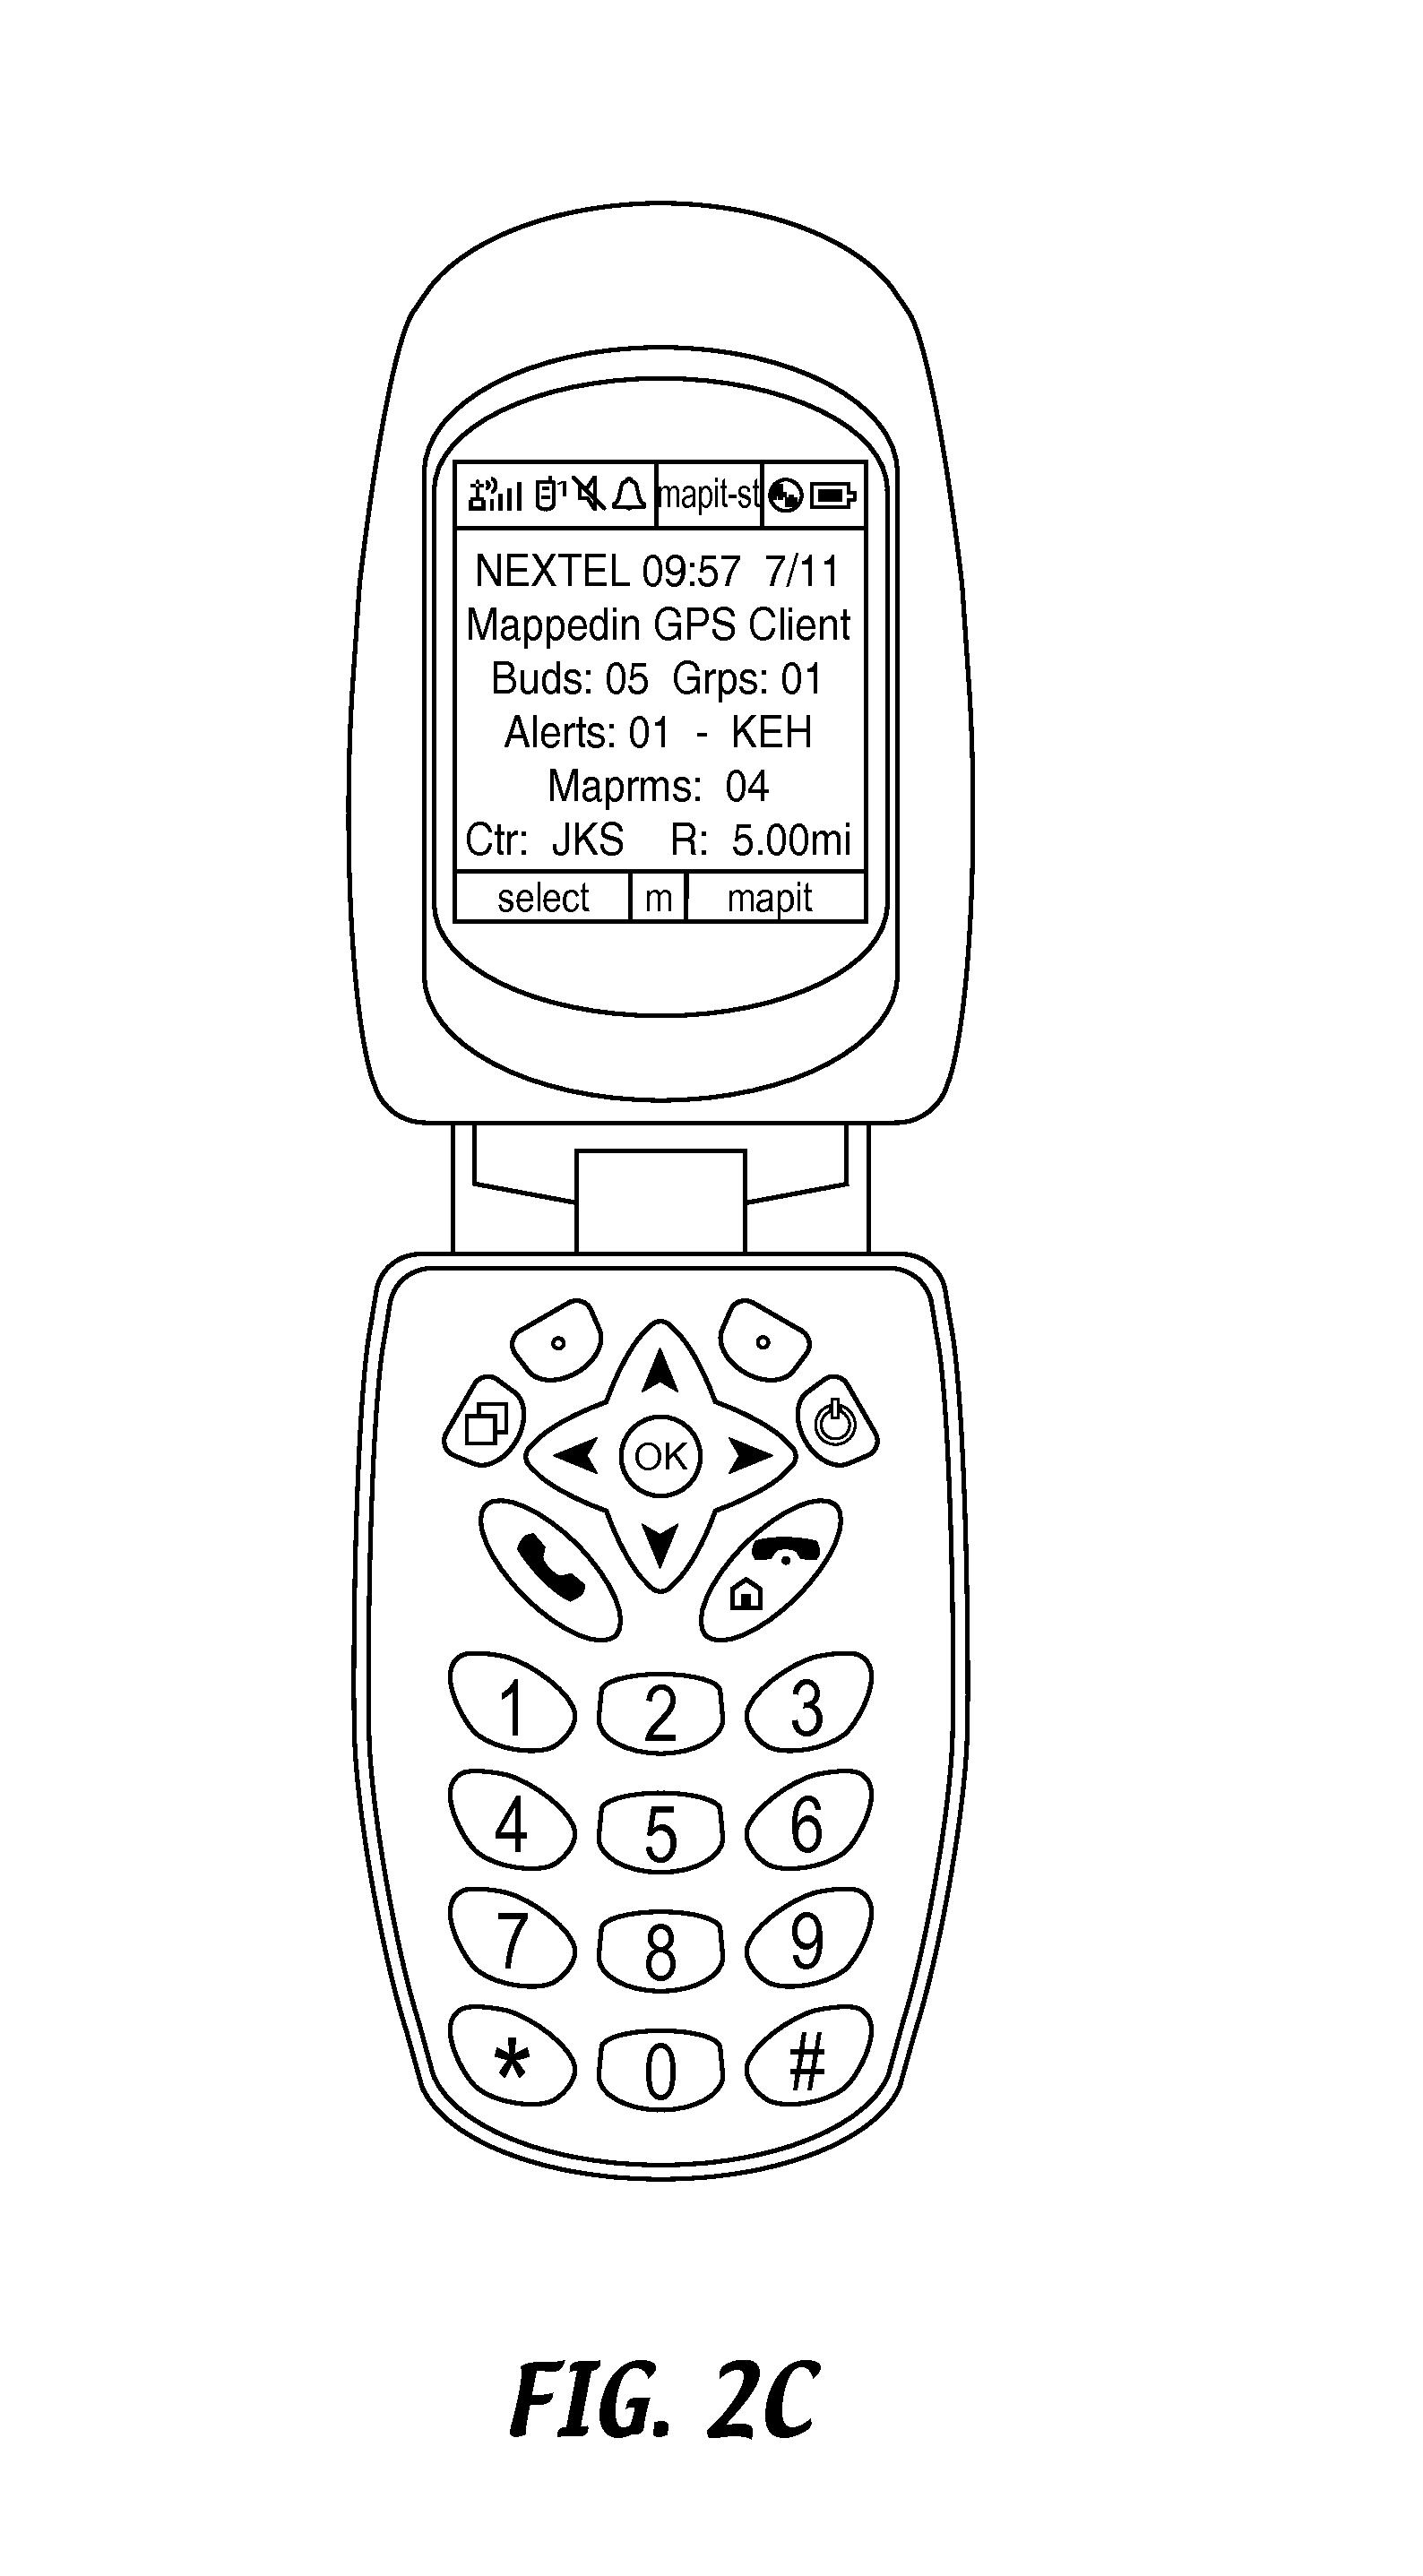 Patent US 9,955,298 B1